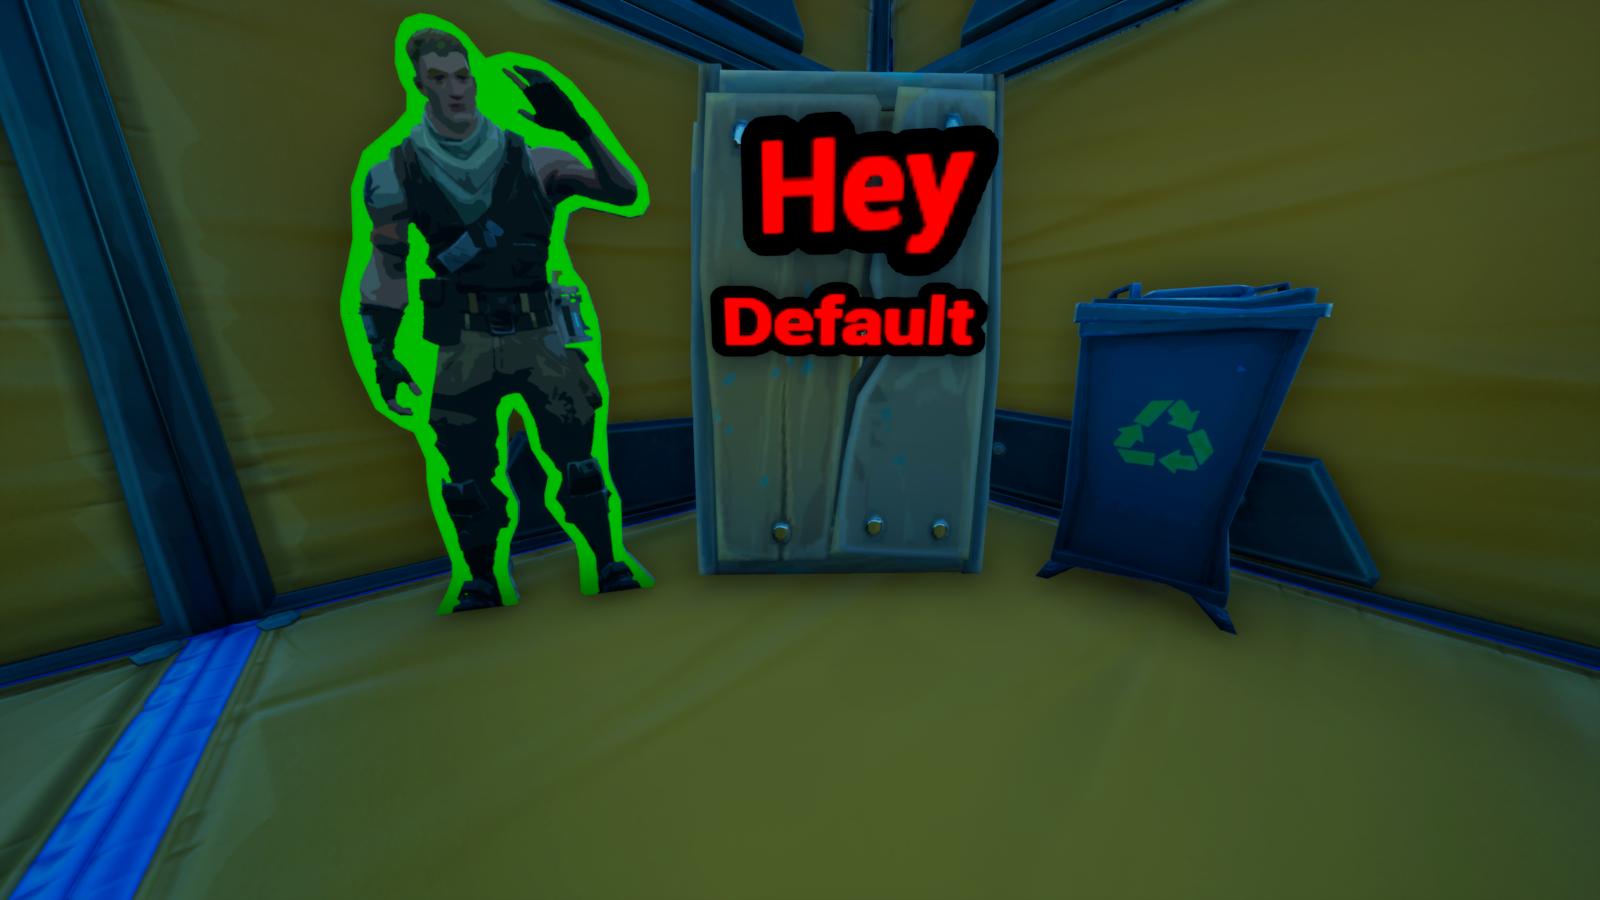 50 Level Default Deathrun 🏃 9067-8863-5745 by fhsupport